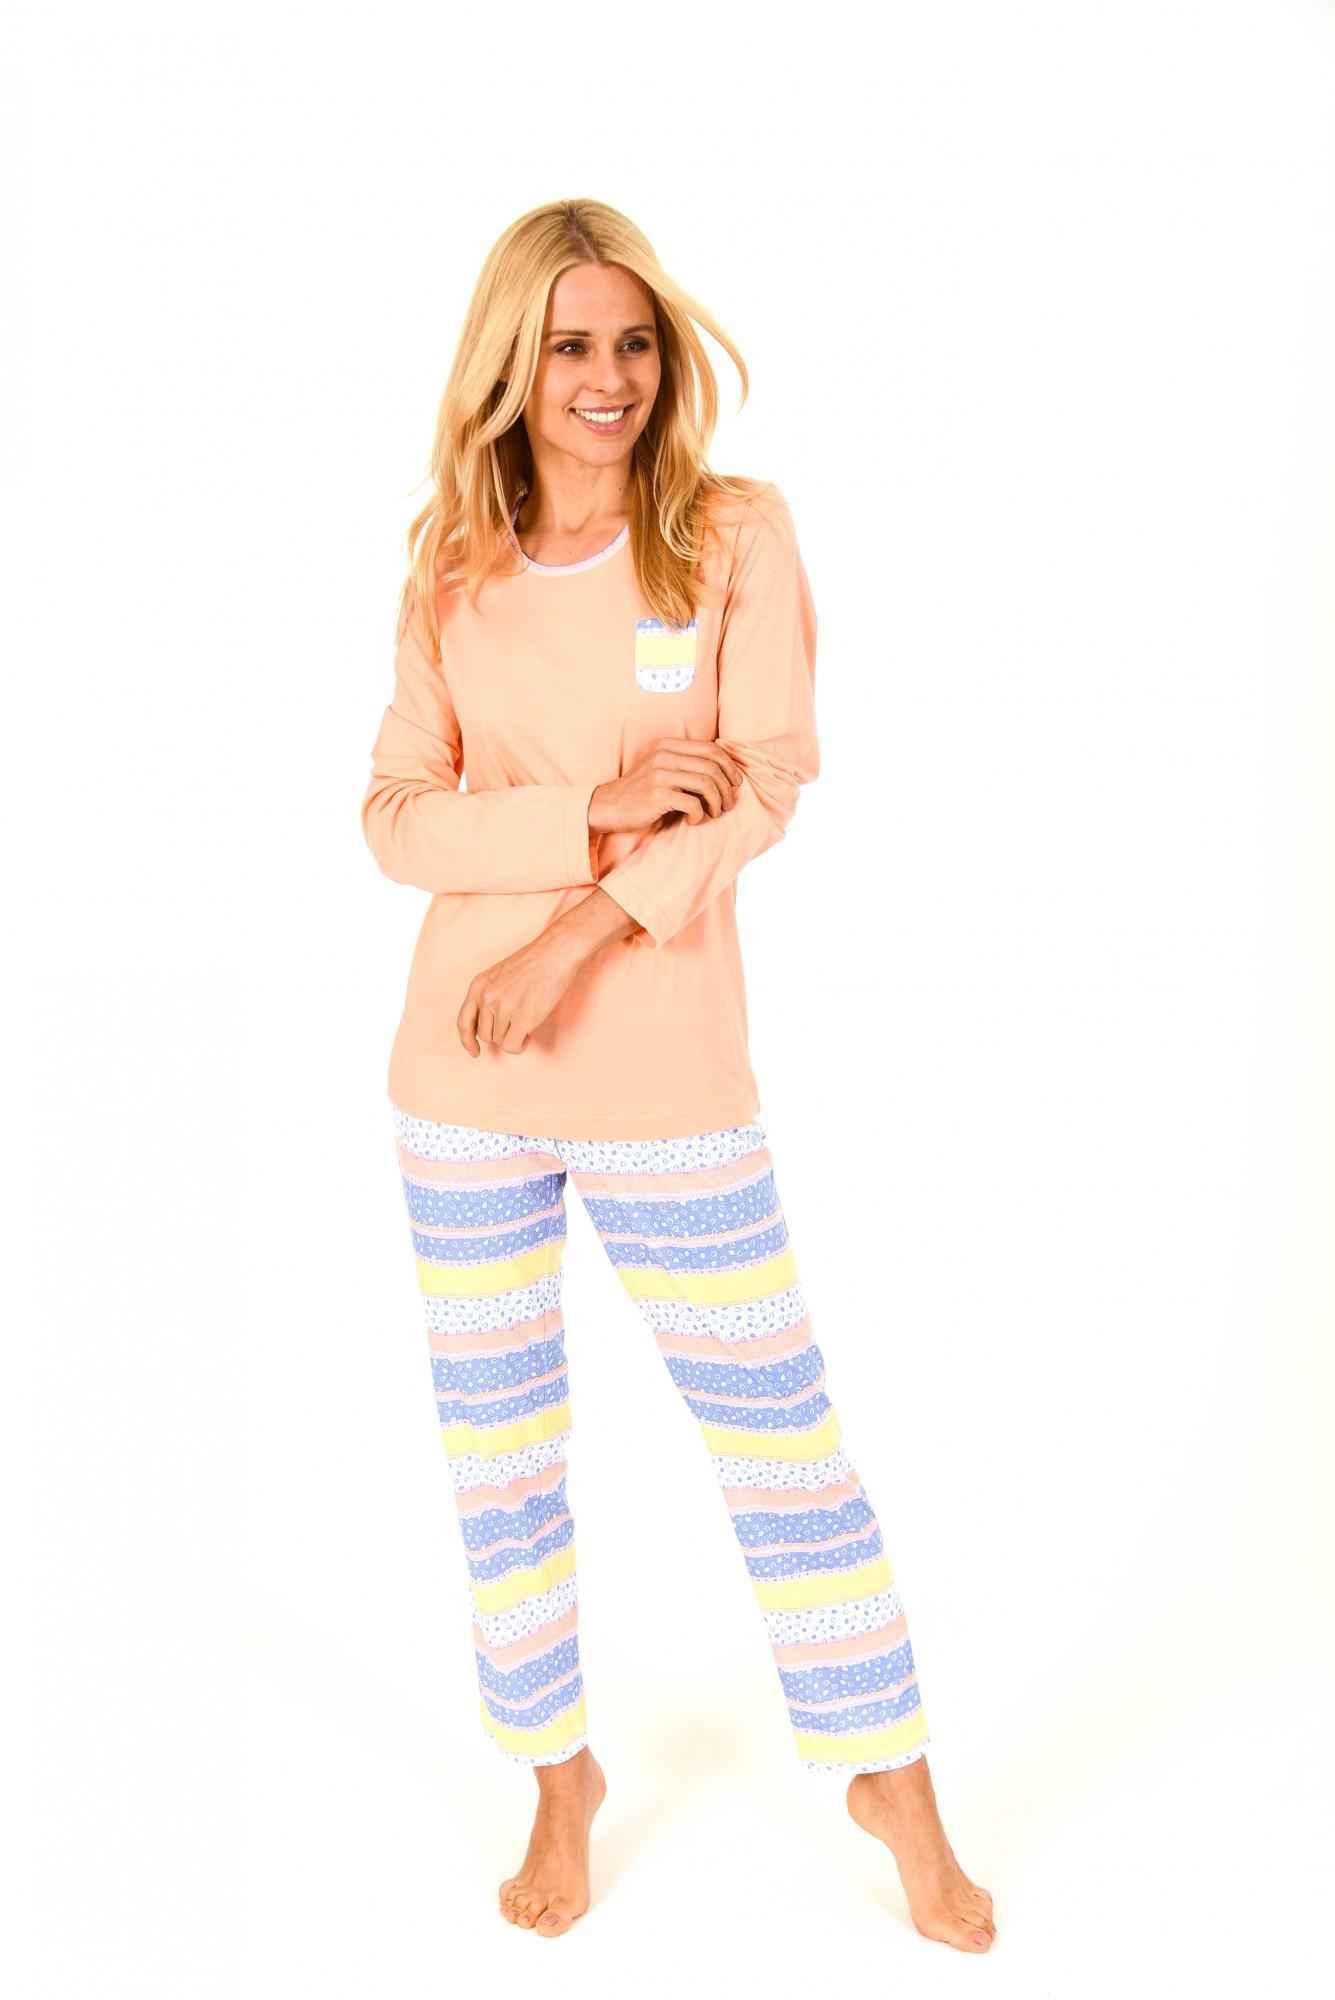 Schöner Damen Pyjama langarm in toller Optik – 171 201 90 815